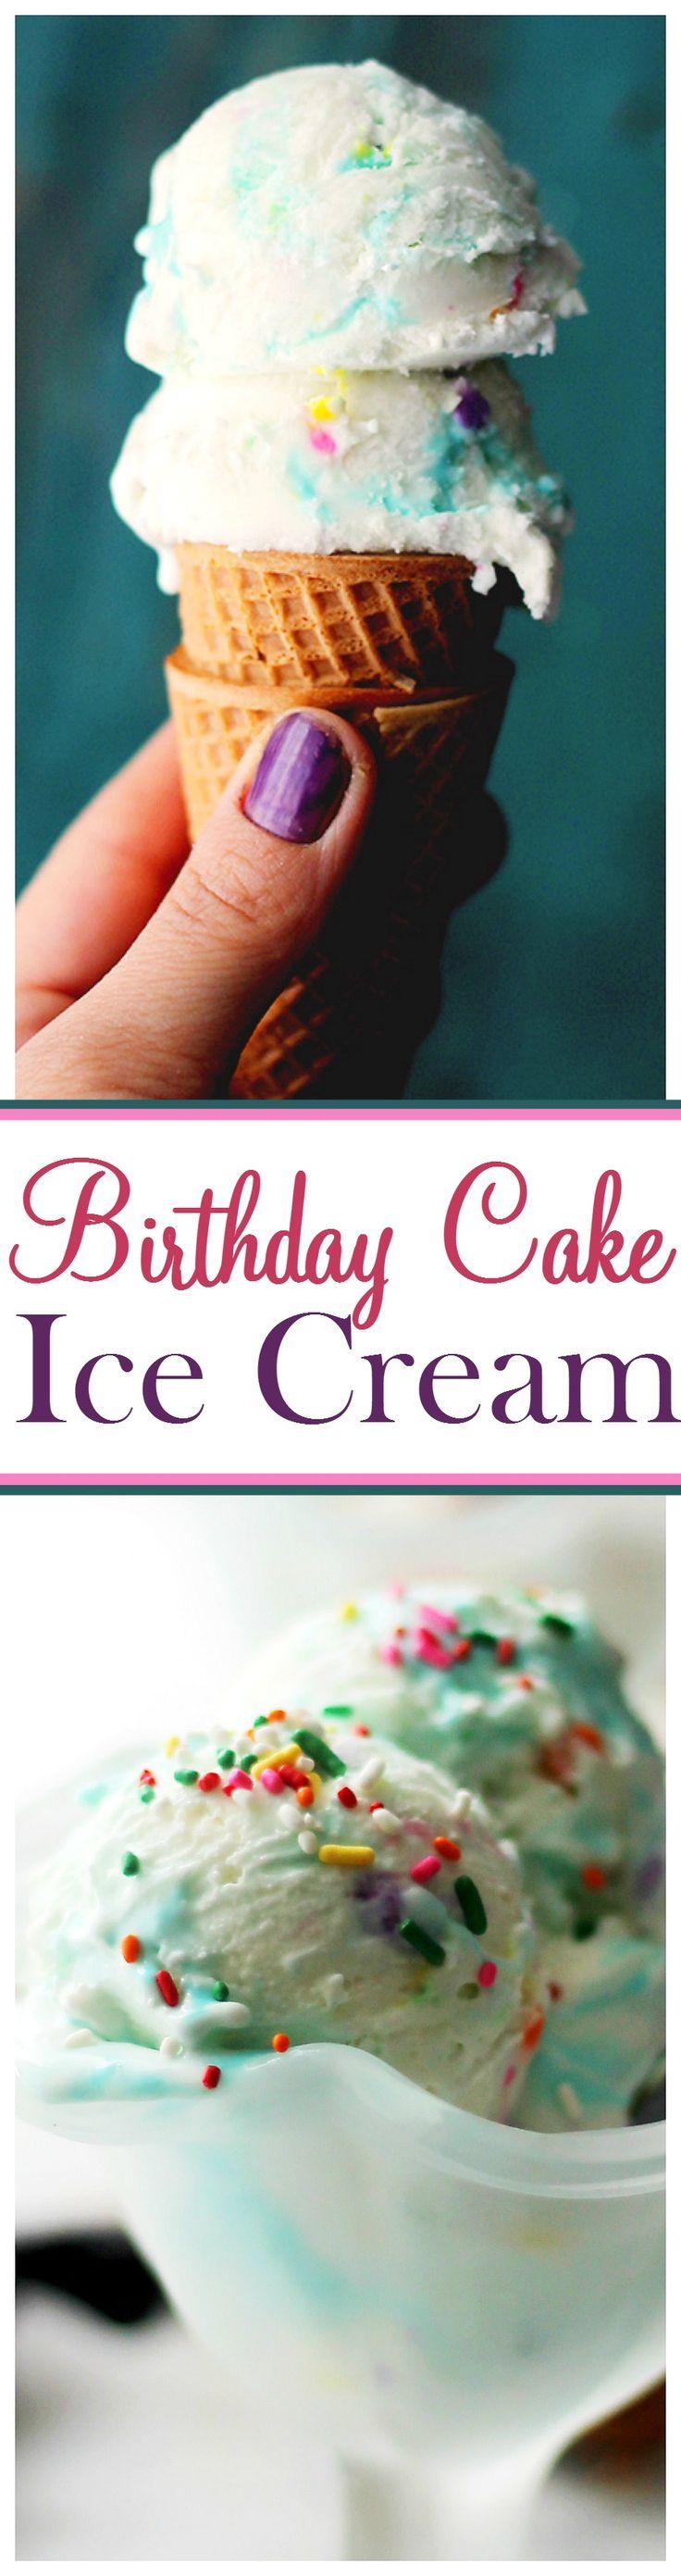 Birthday Cake Ice Cream combines your favorite party treats into one ...